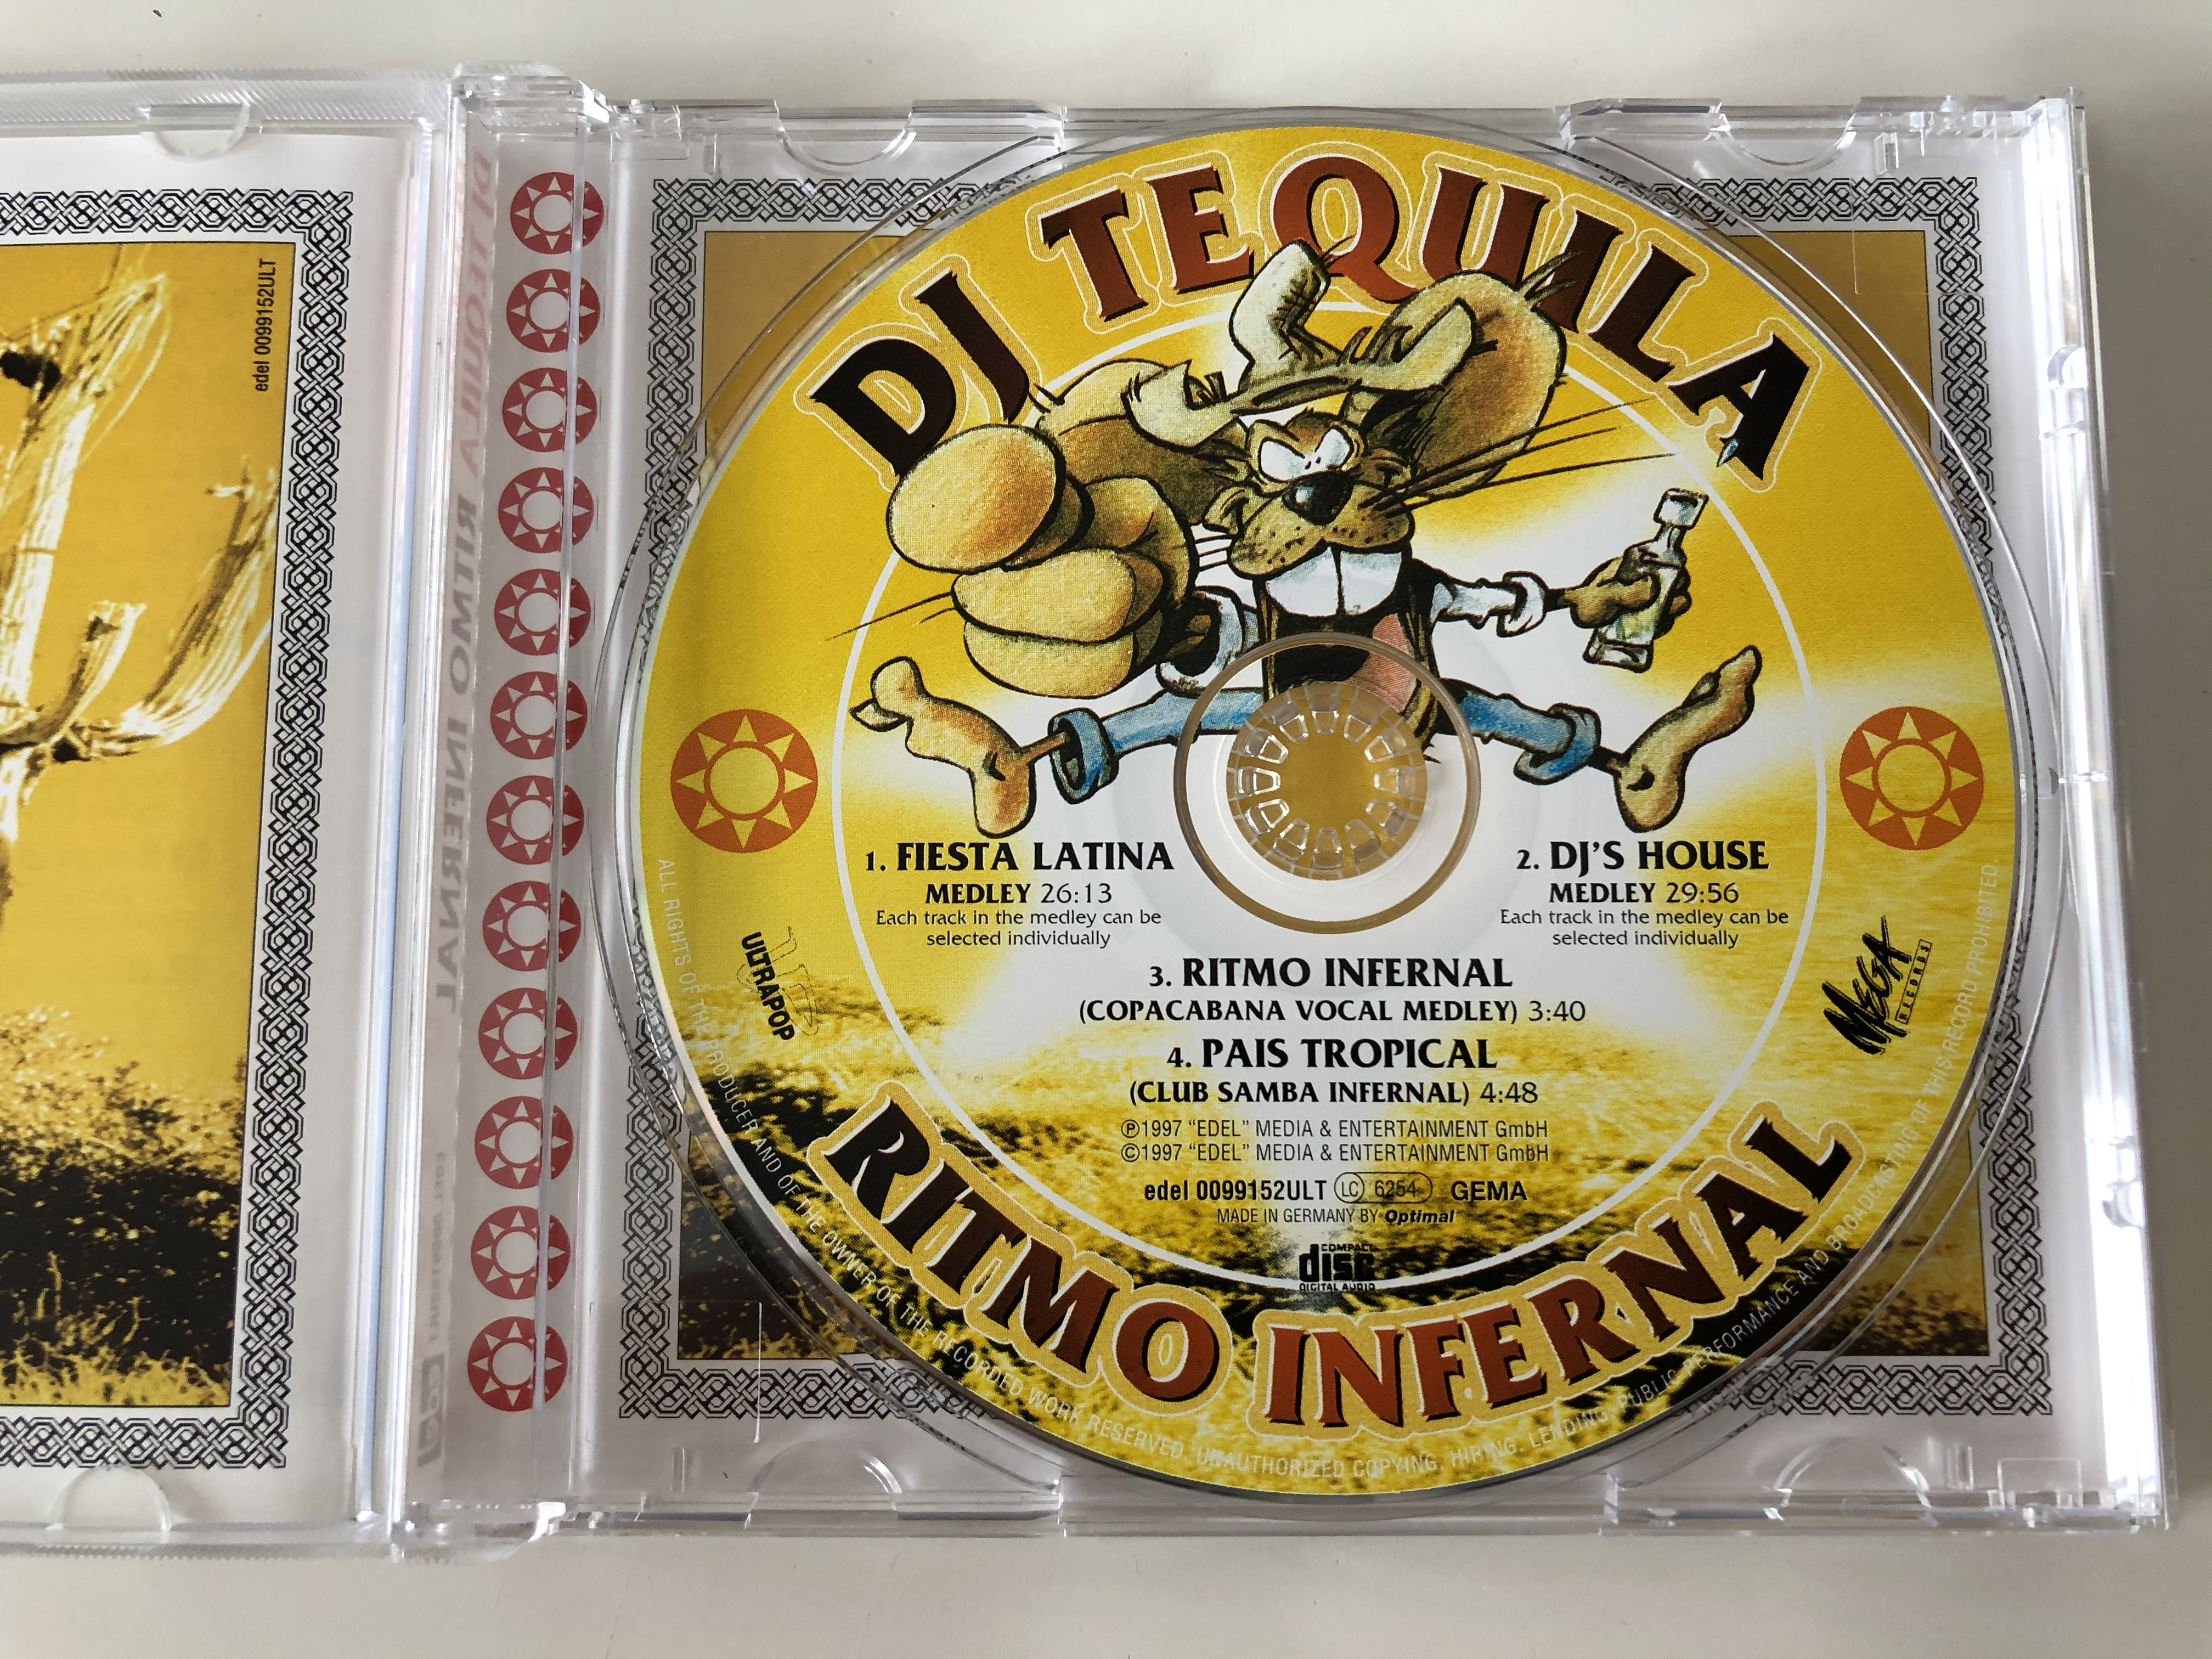 dj-tequila-ritmo-infernal-the-best-of-latin-dance-music-on-135bpm-ultrapop-audio-cd-1997-0099152ult-6-.jpg